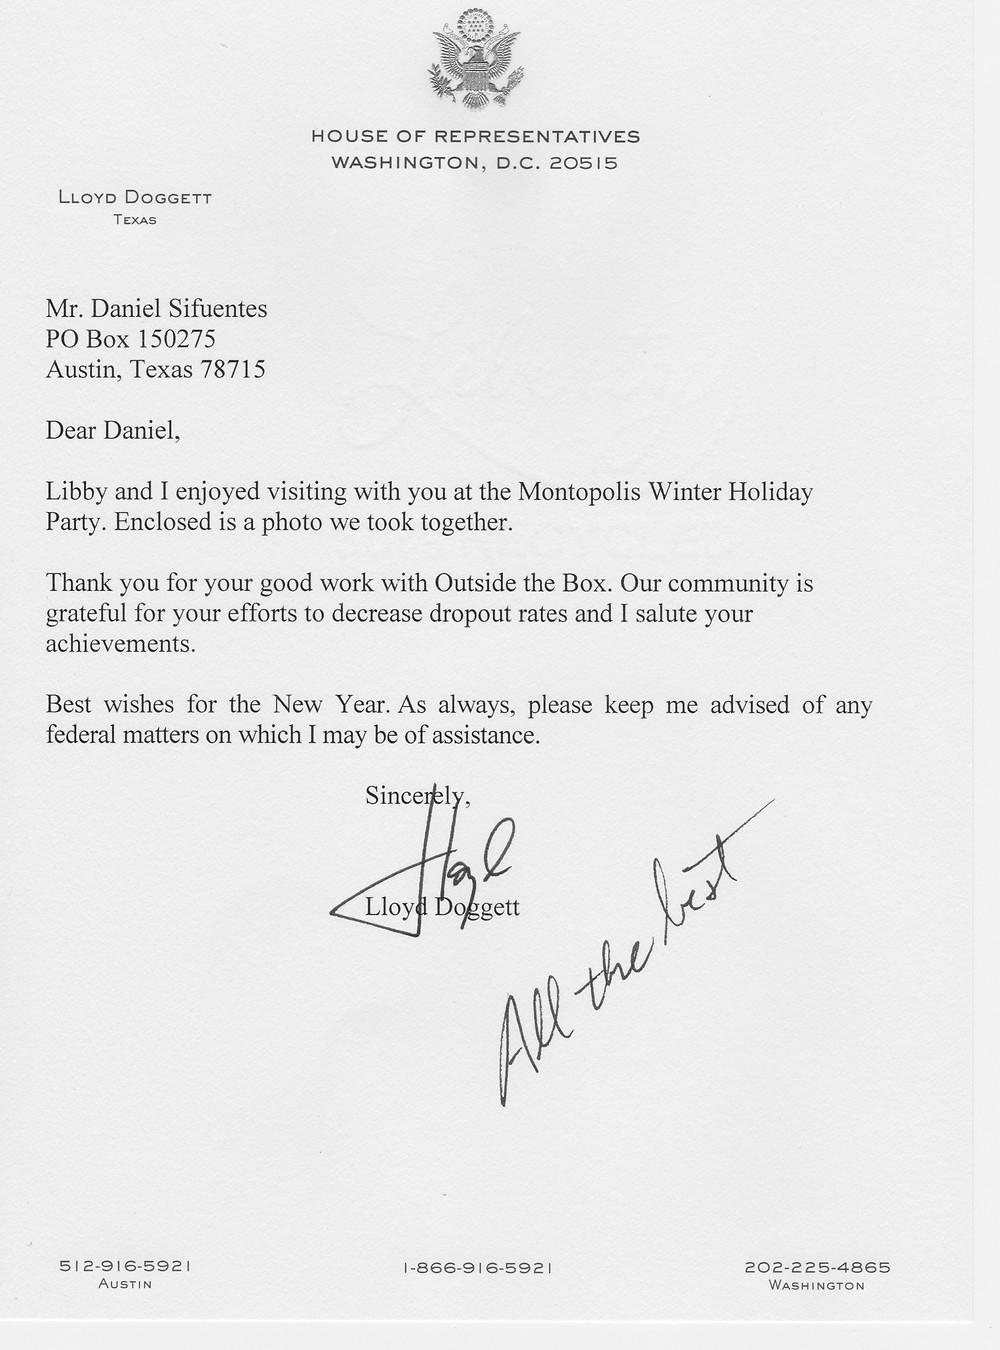 Doggett Letter.jpeg